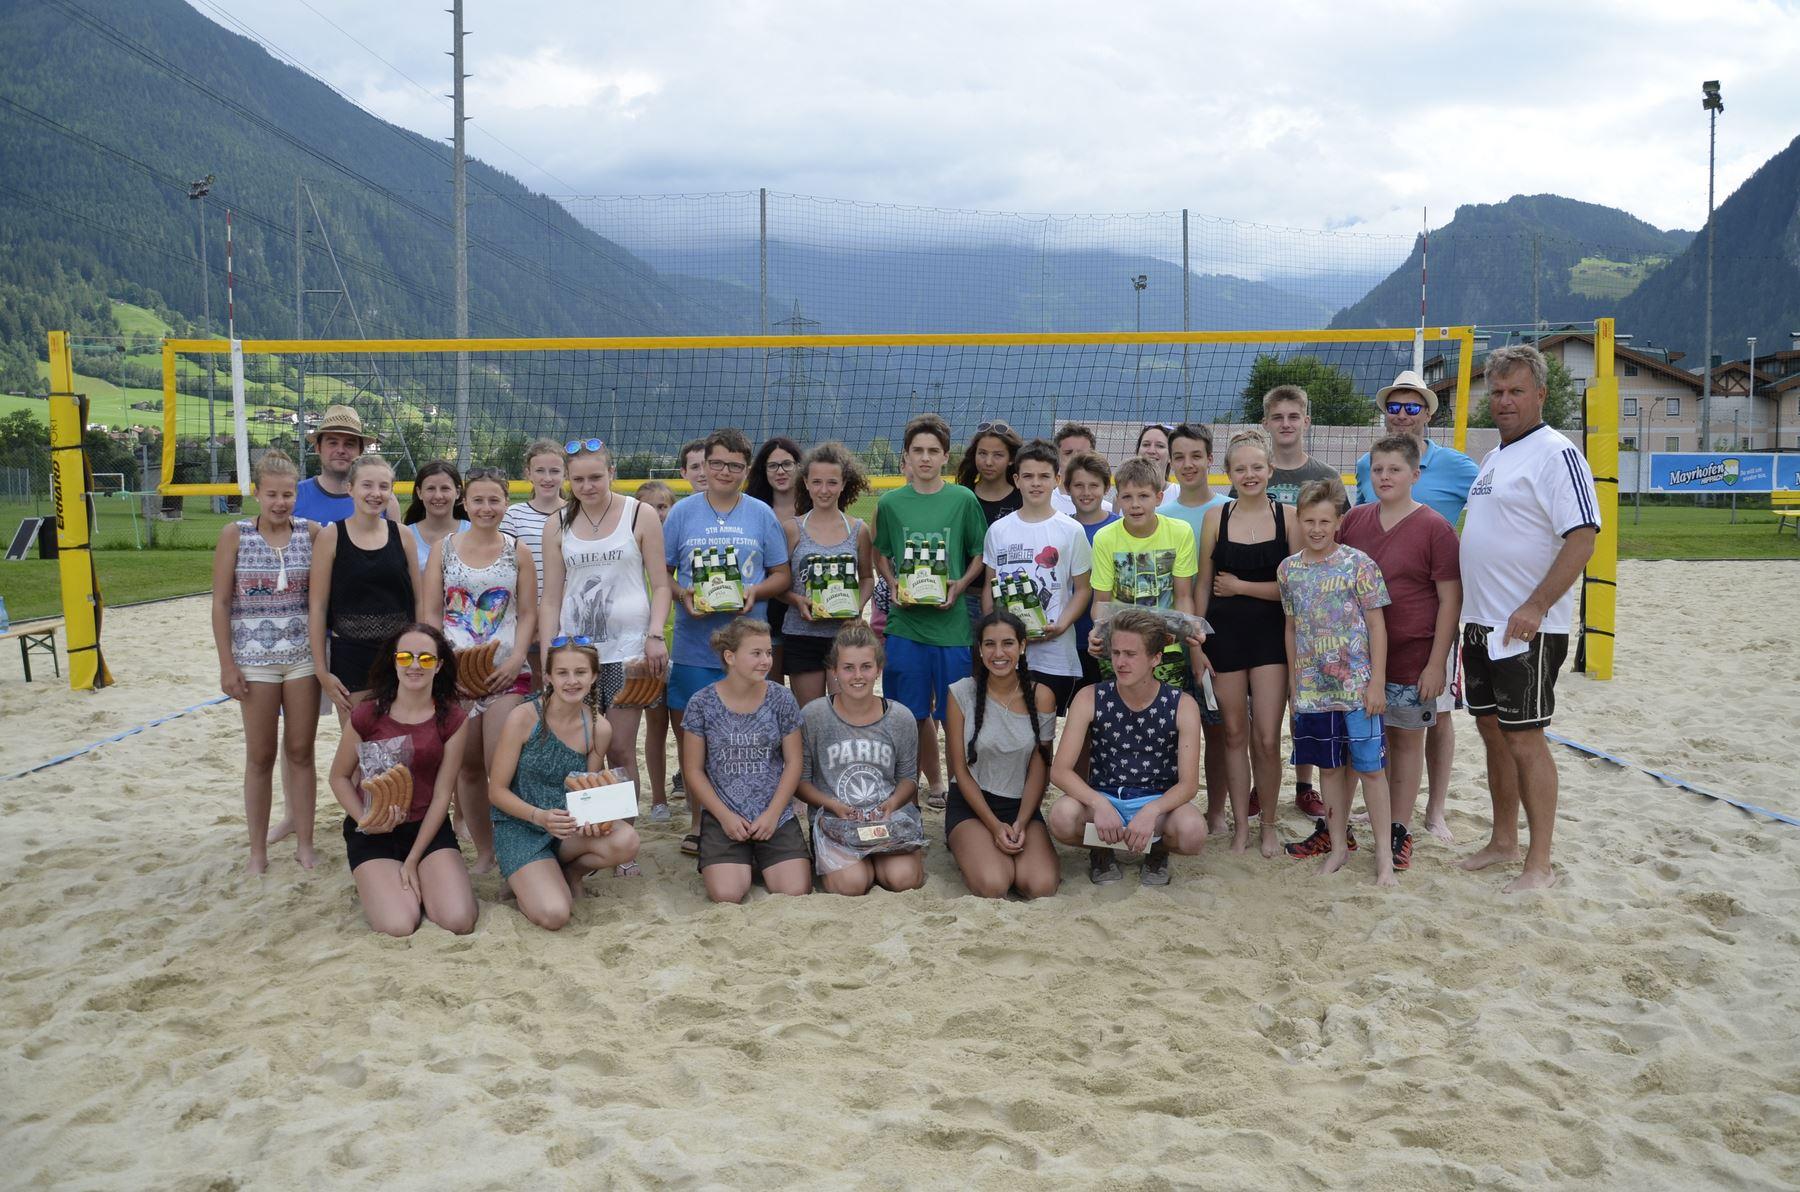 2016-07-02 Beachvolleyball 282